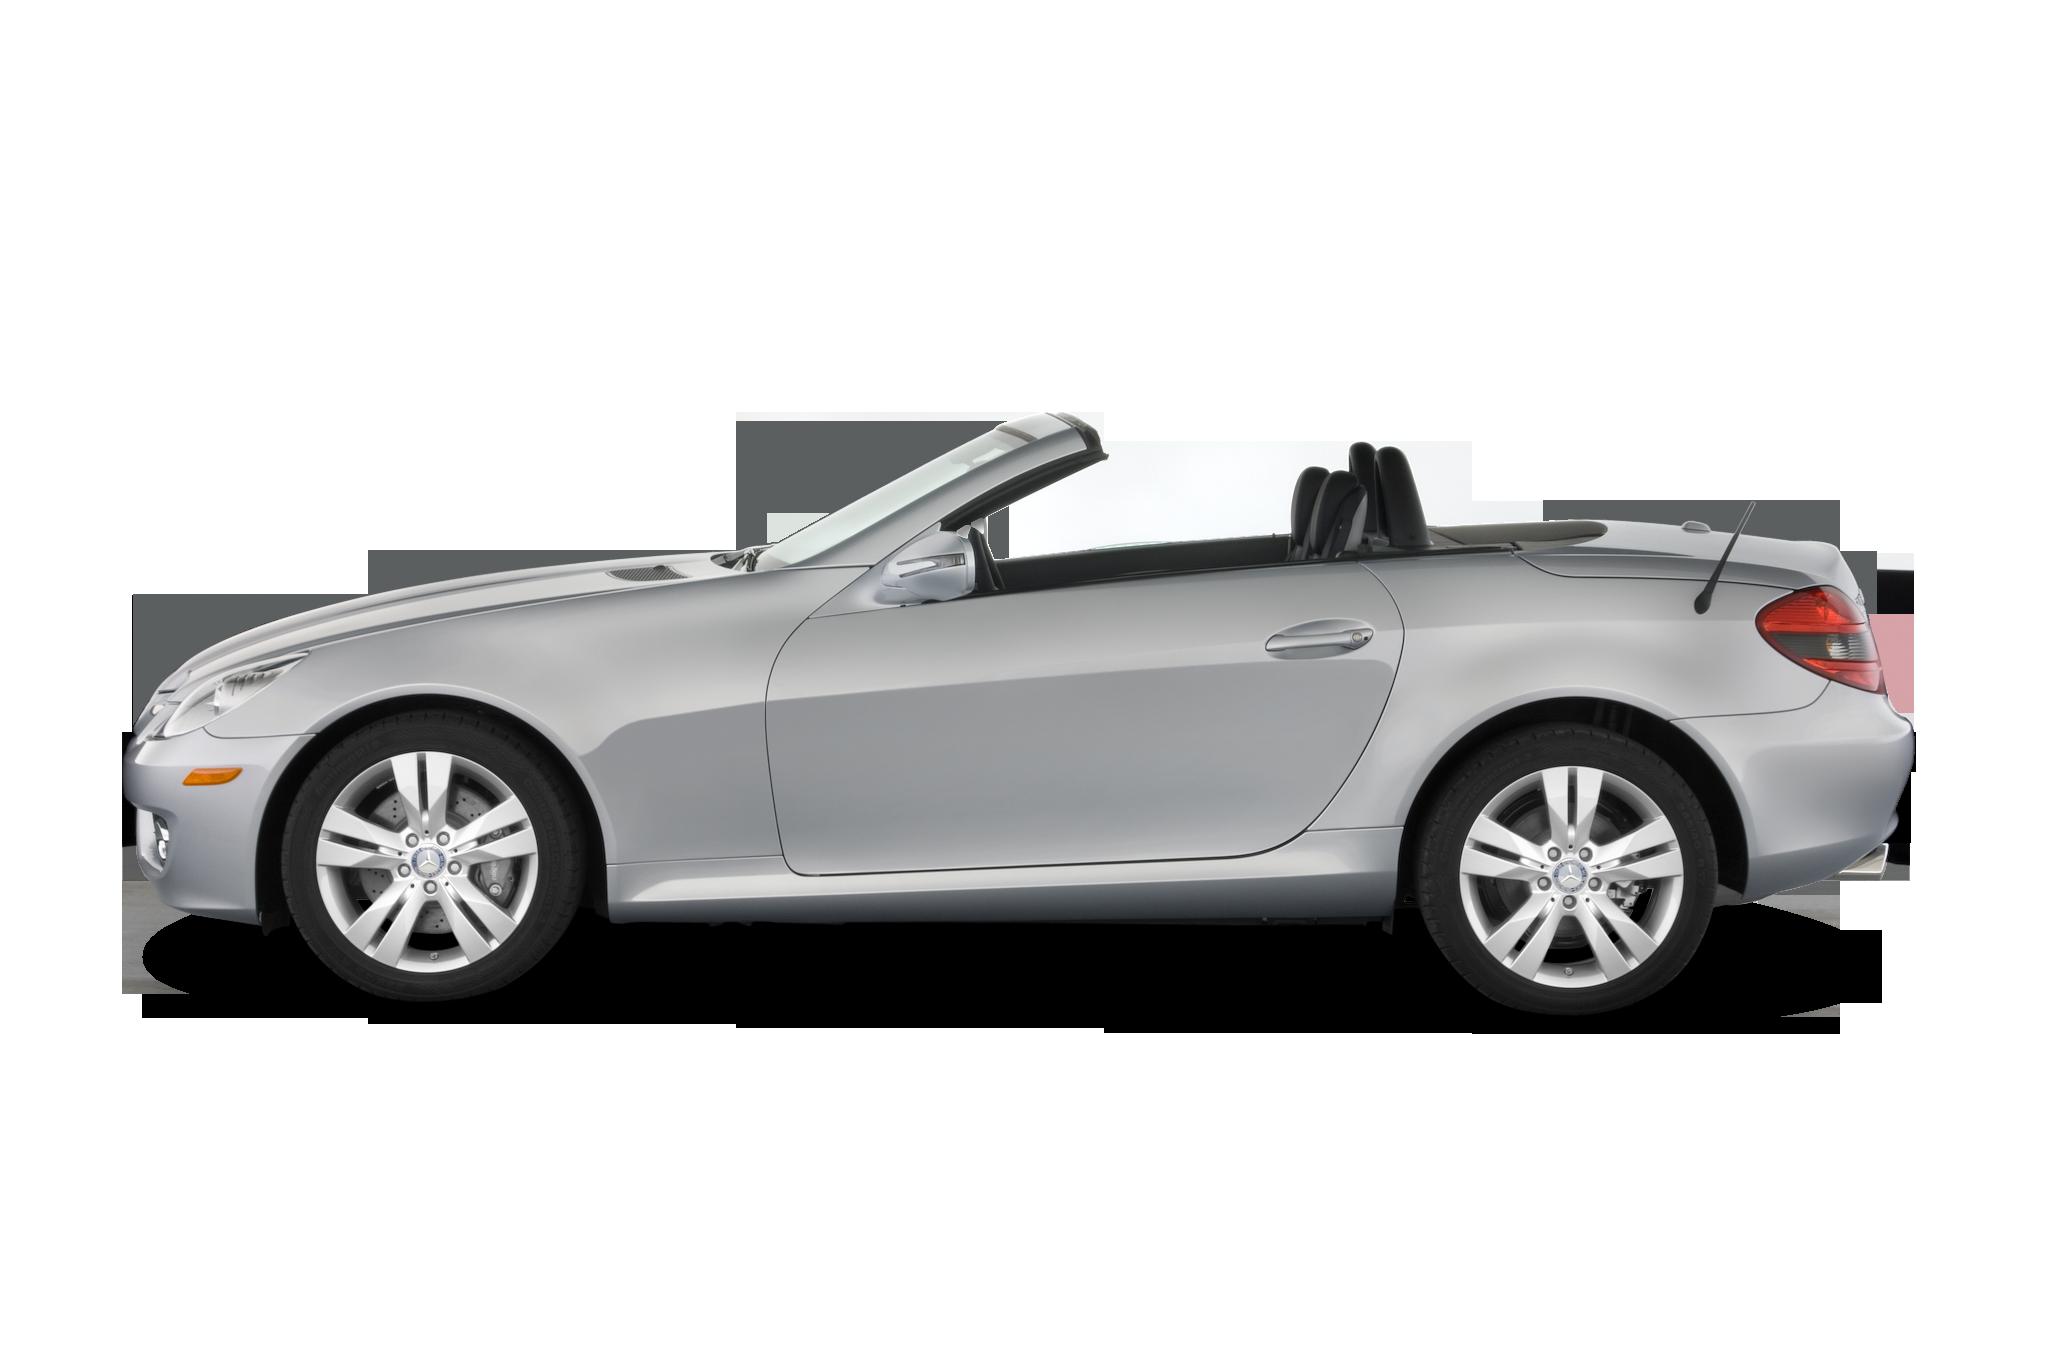 benz car wallpaper automotive mercedes next slk